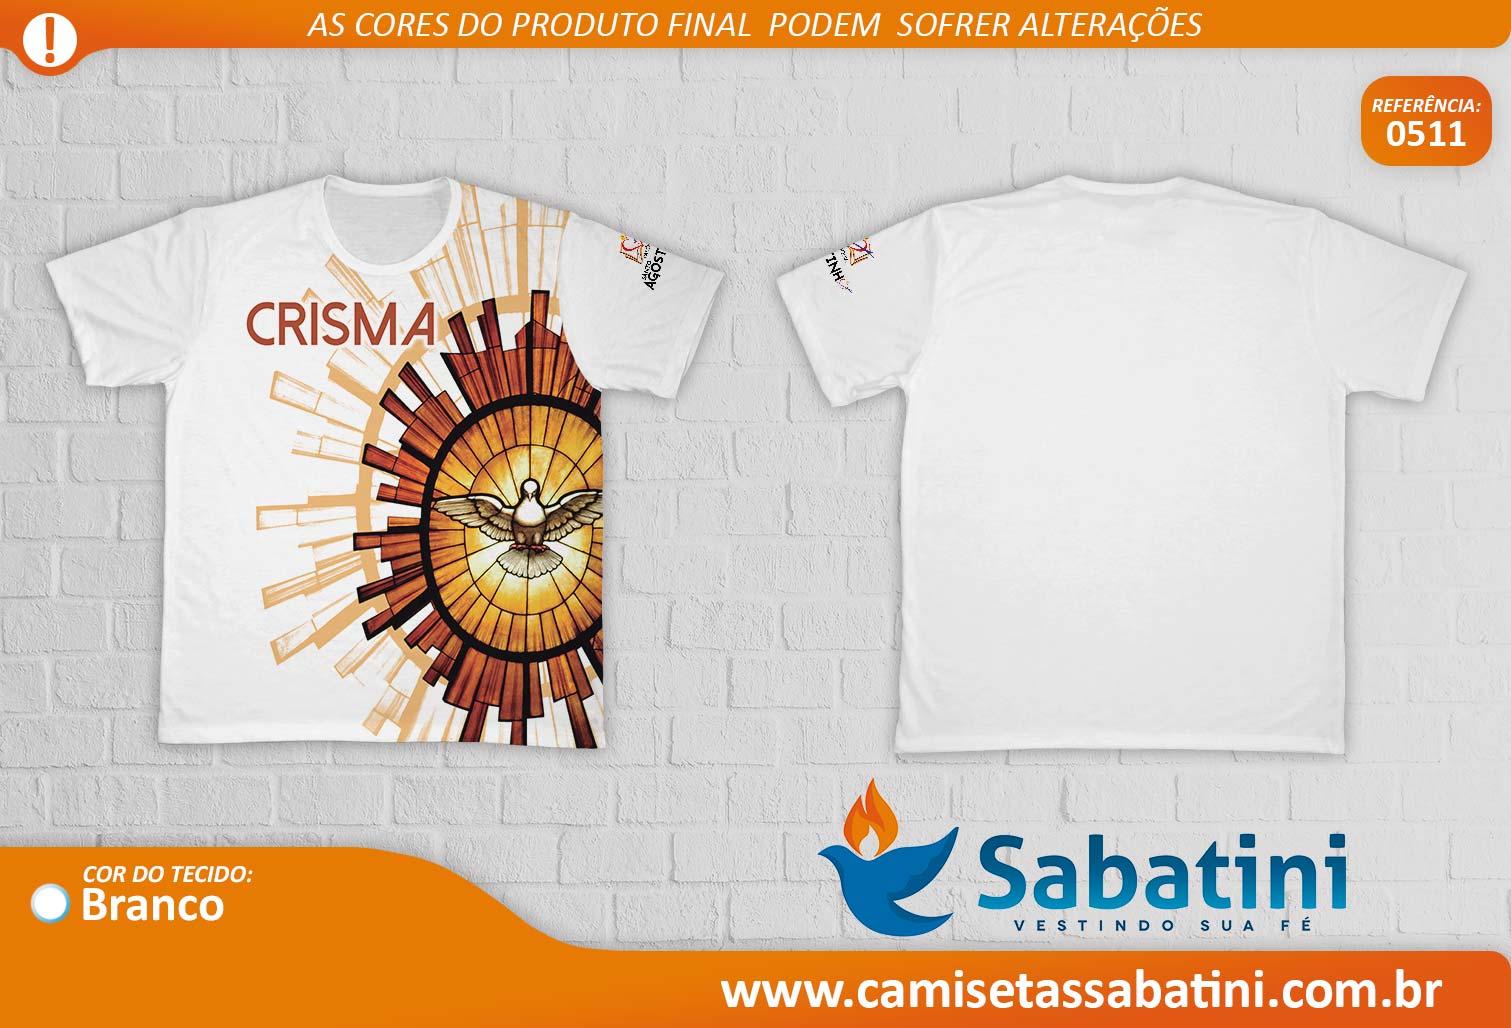 Camiseta Personalizada - REF.0511 Crisma - Paróquia Santo Agostinho - ID15138478  - Camisetas Sabatini